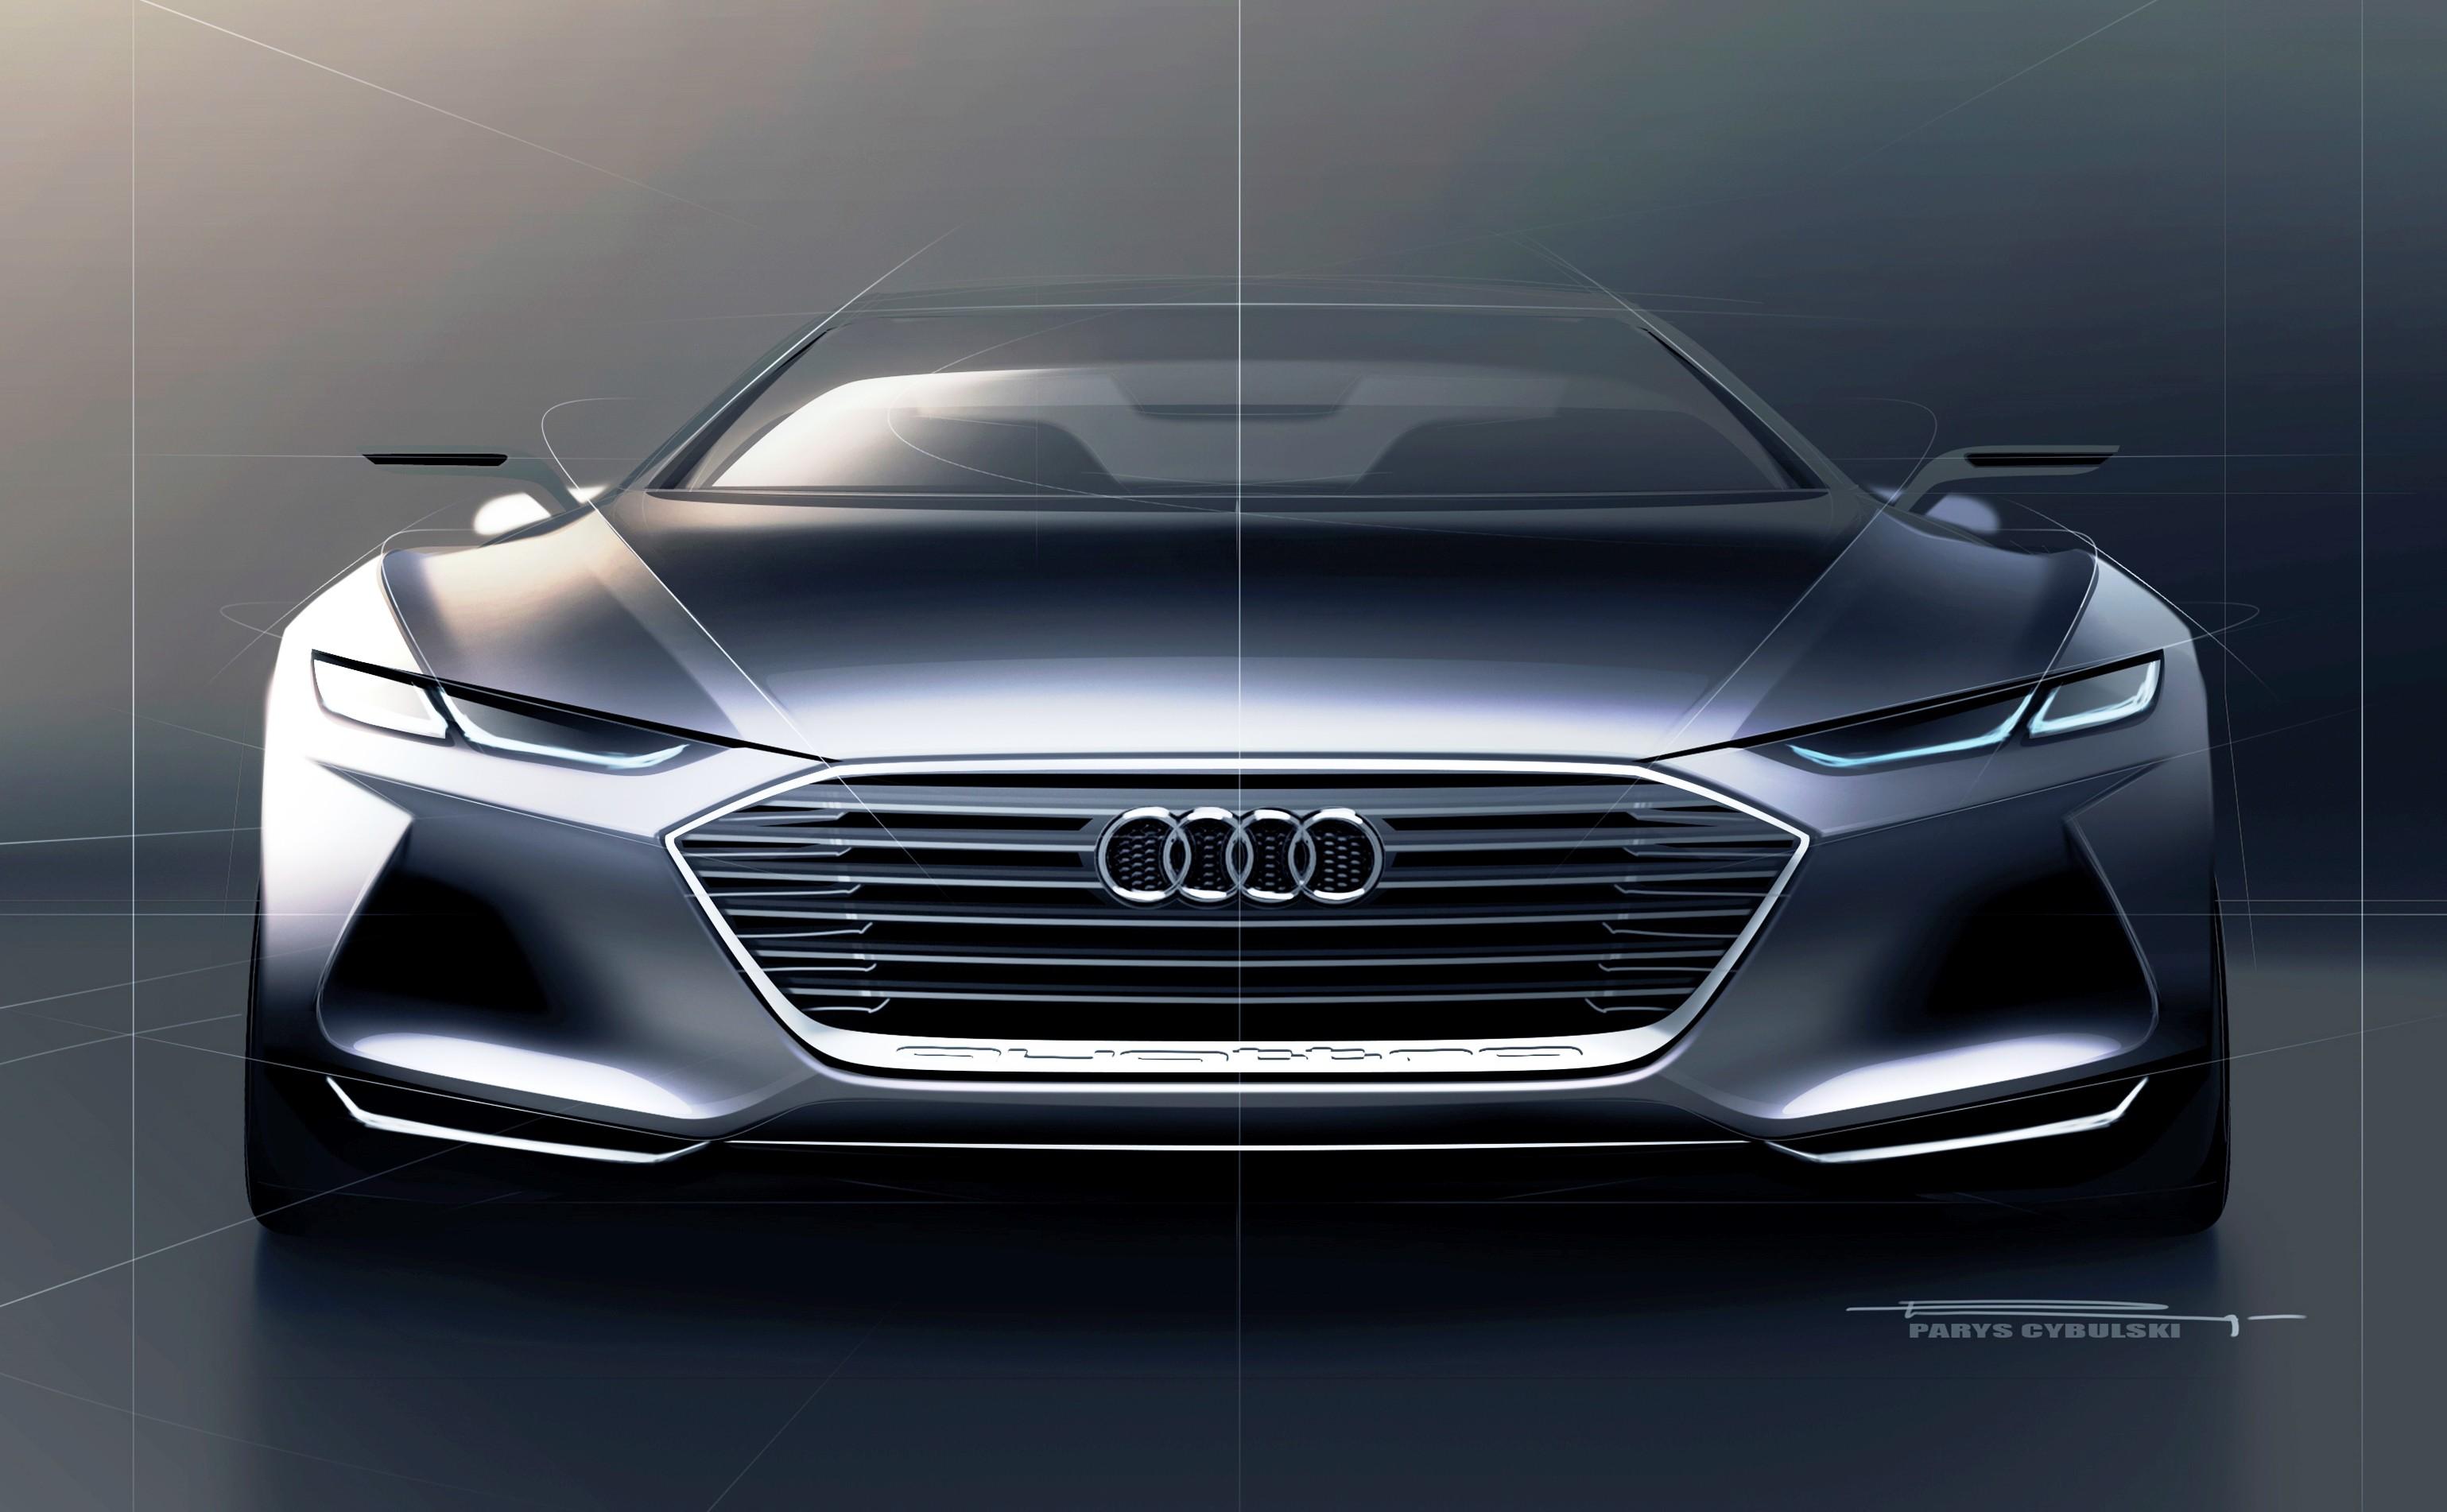 2014 Audi Prologue is Worst of LA 2014 4